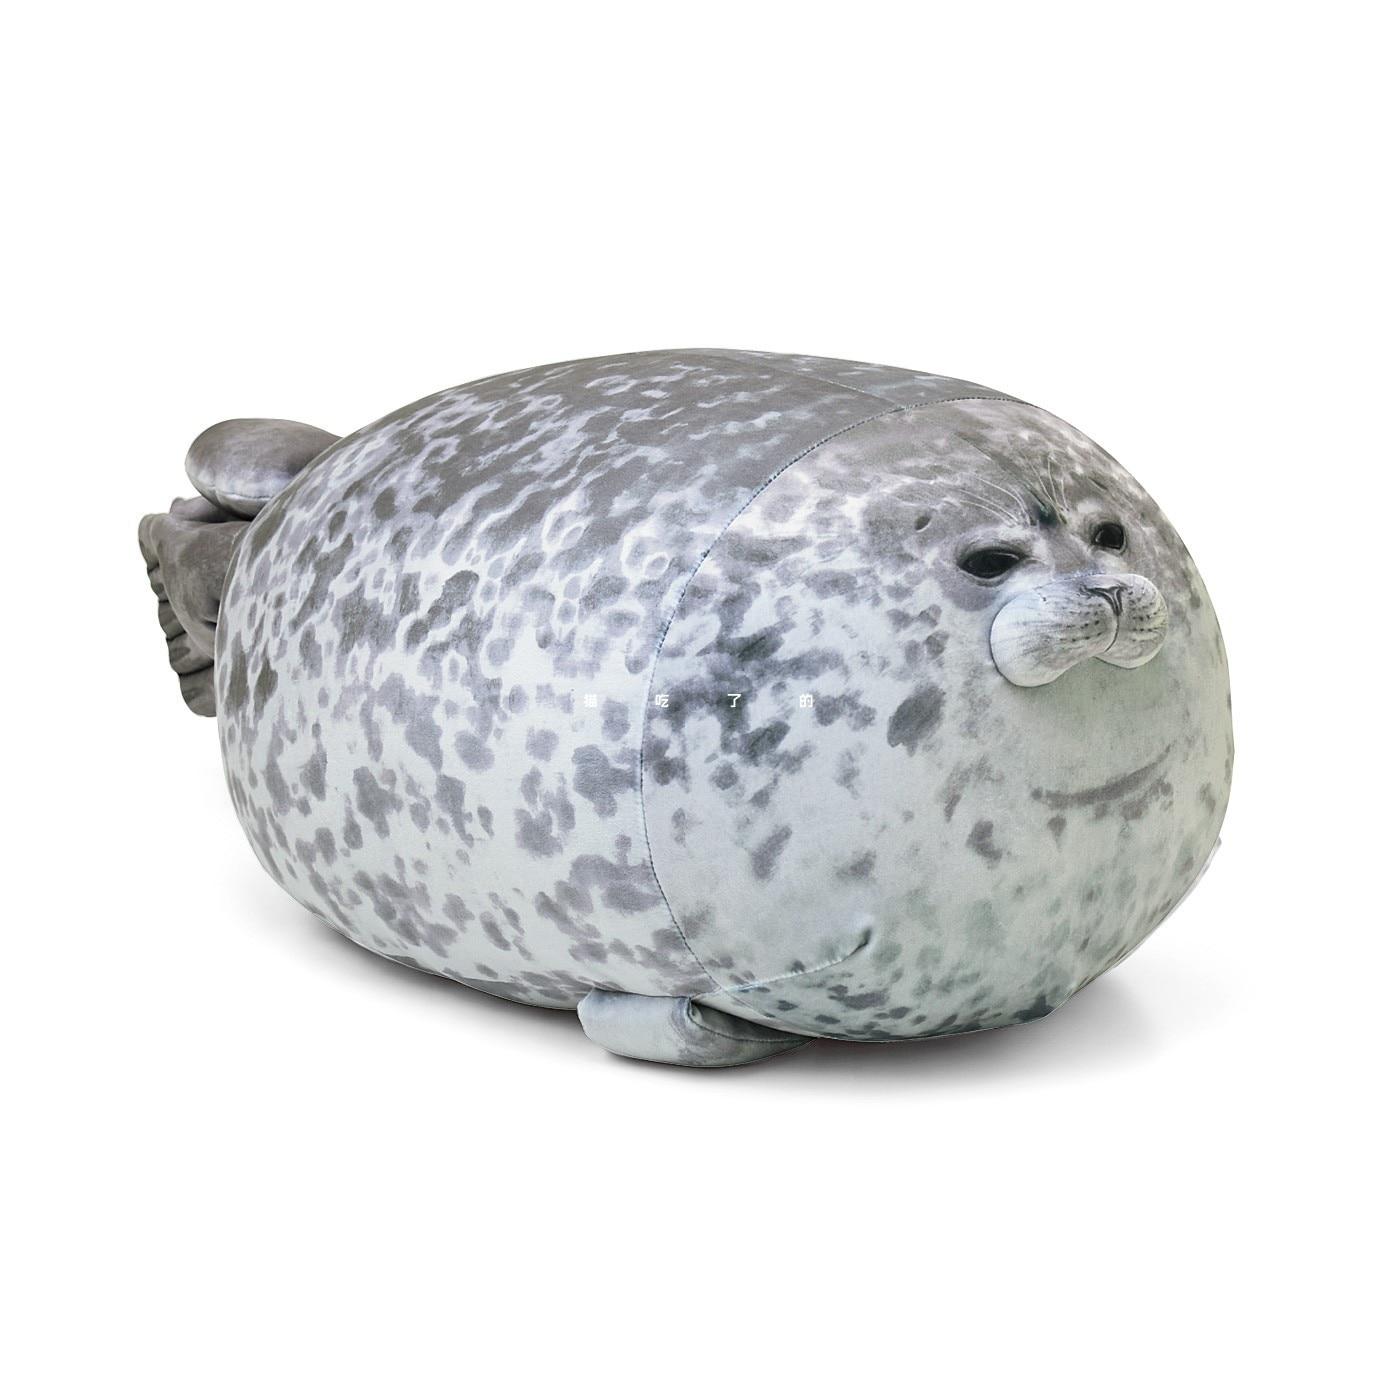 Seal Shaped Throw Pillows Kids Cute Cartoon Soft 3D Plush Sea World Animal Baby Sea Lion Plush Stuffed Sleeping Pillow Doll Toy